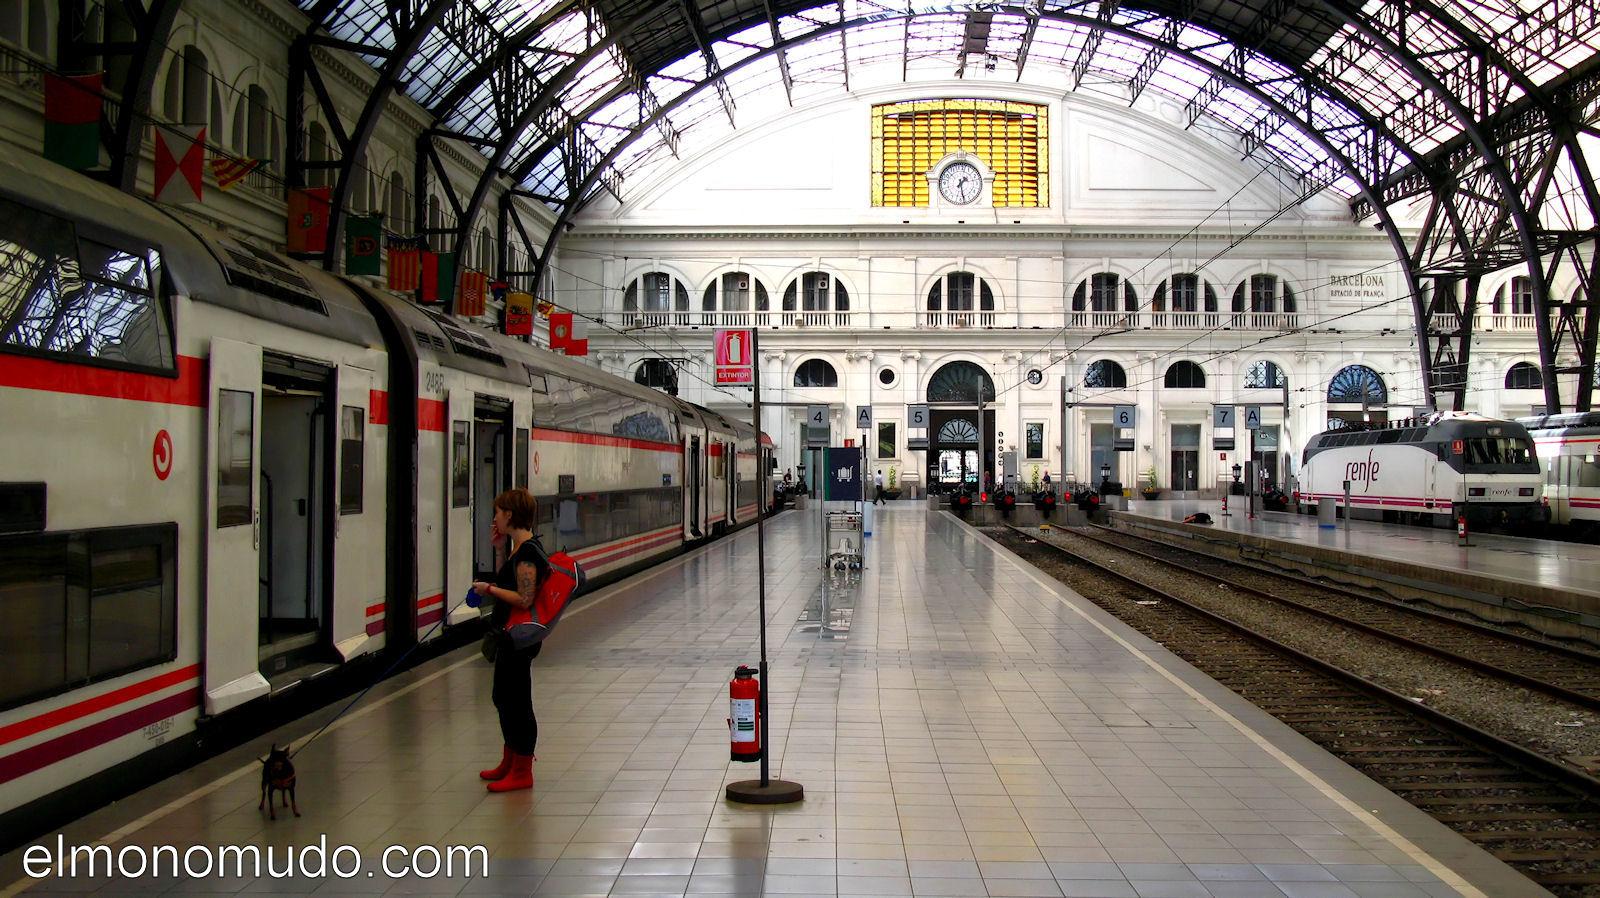 estacion_de_francia_barcelona_2010_8